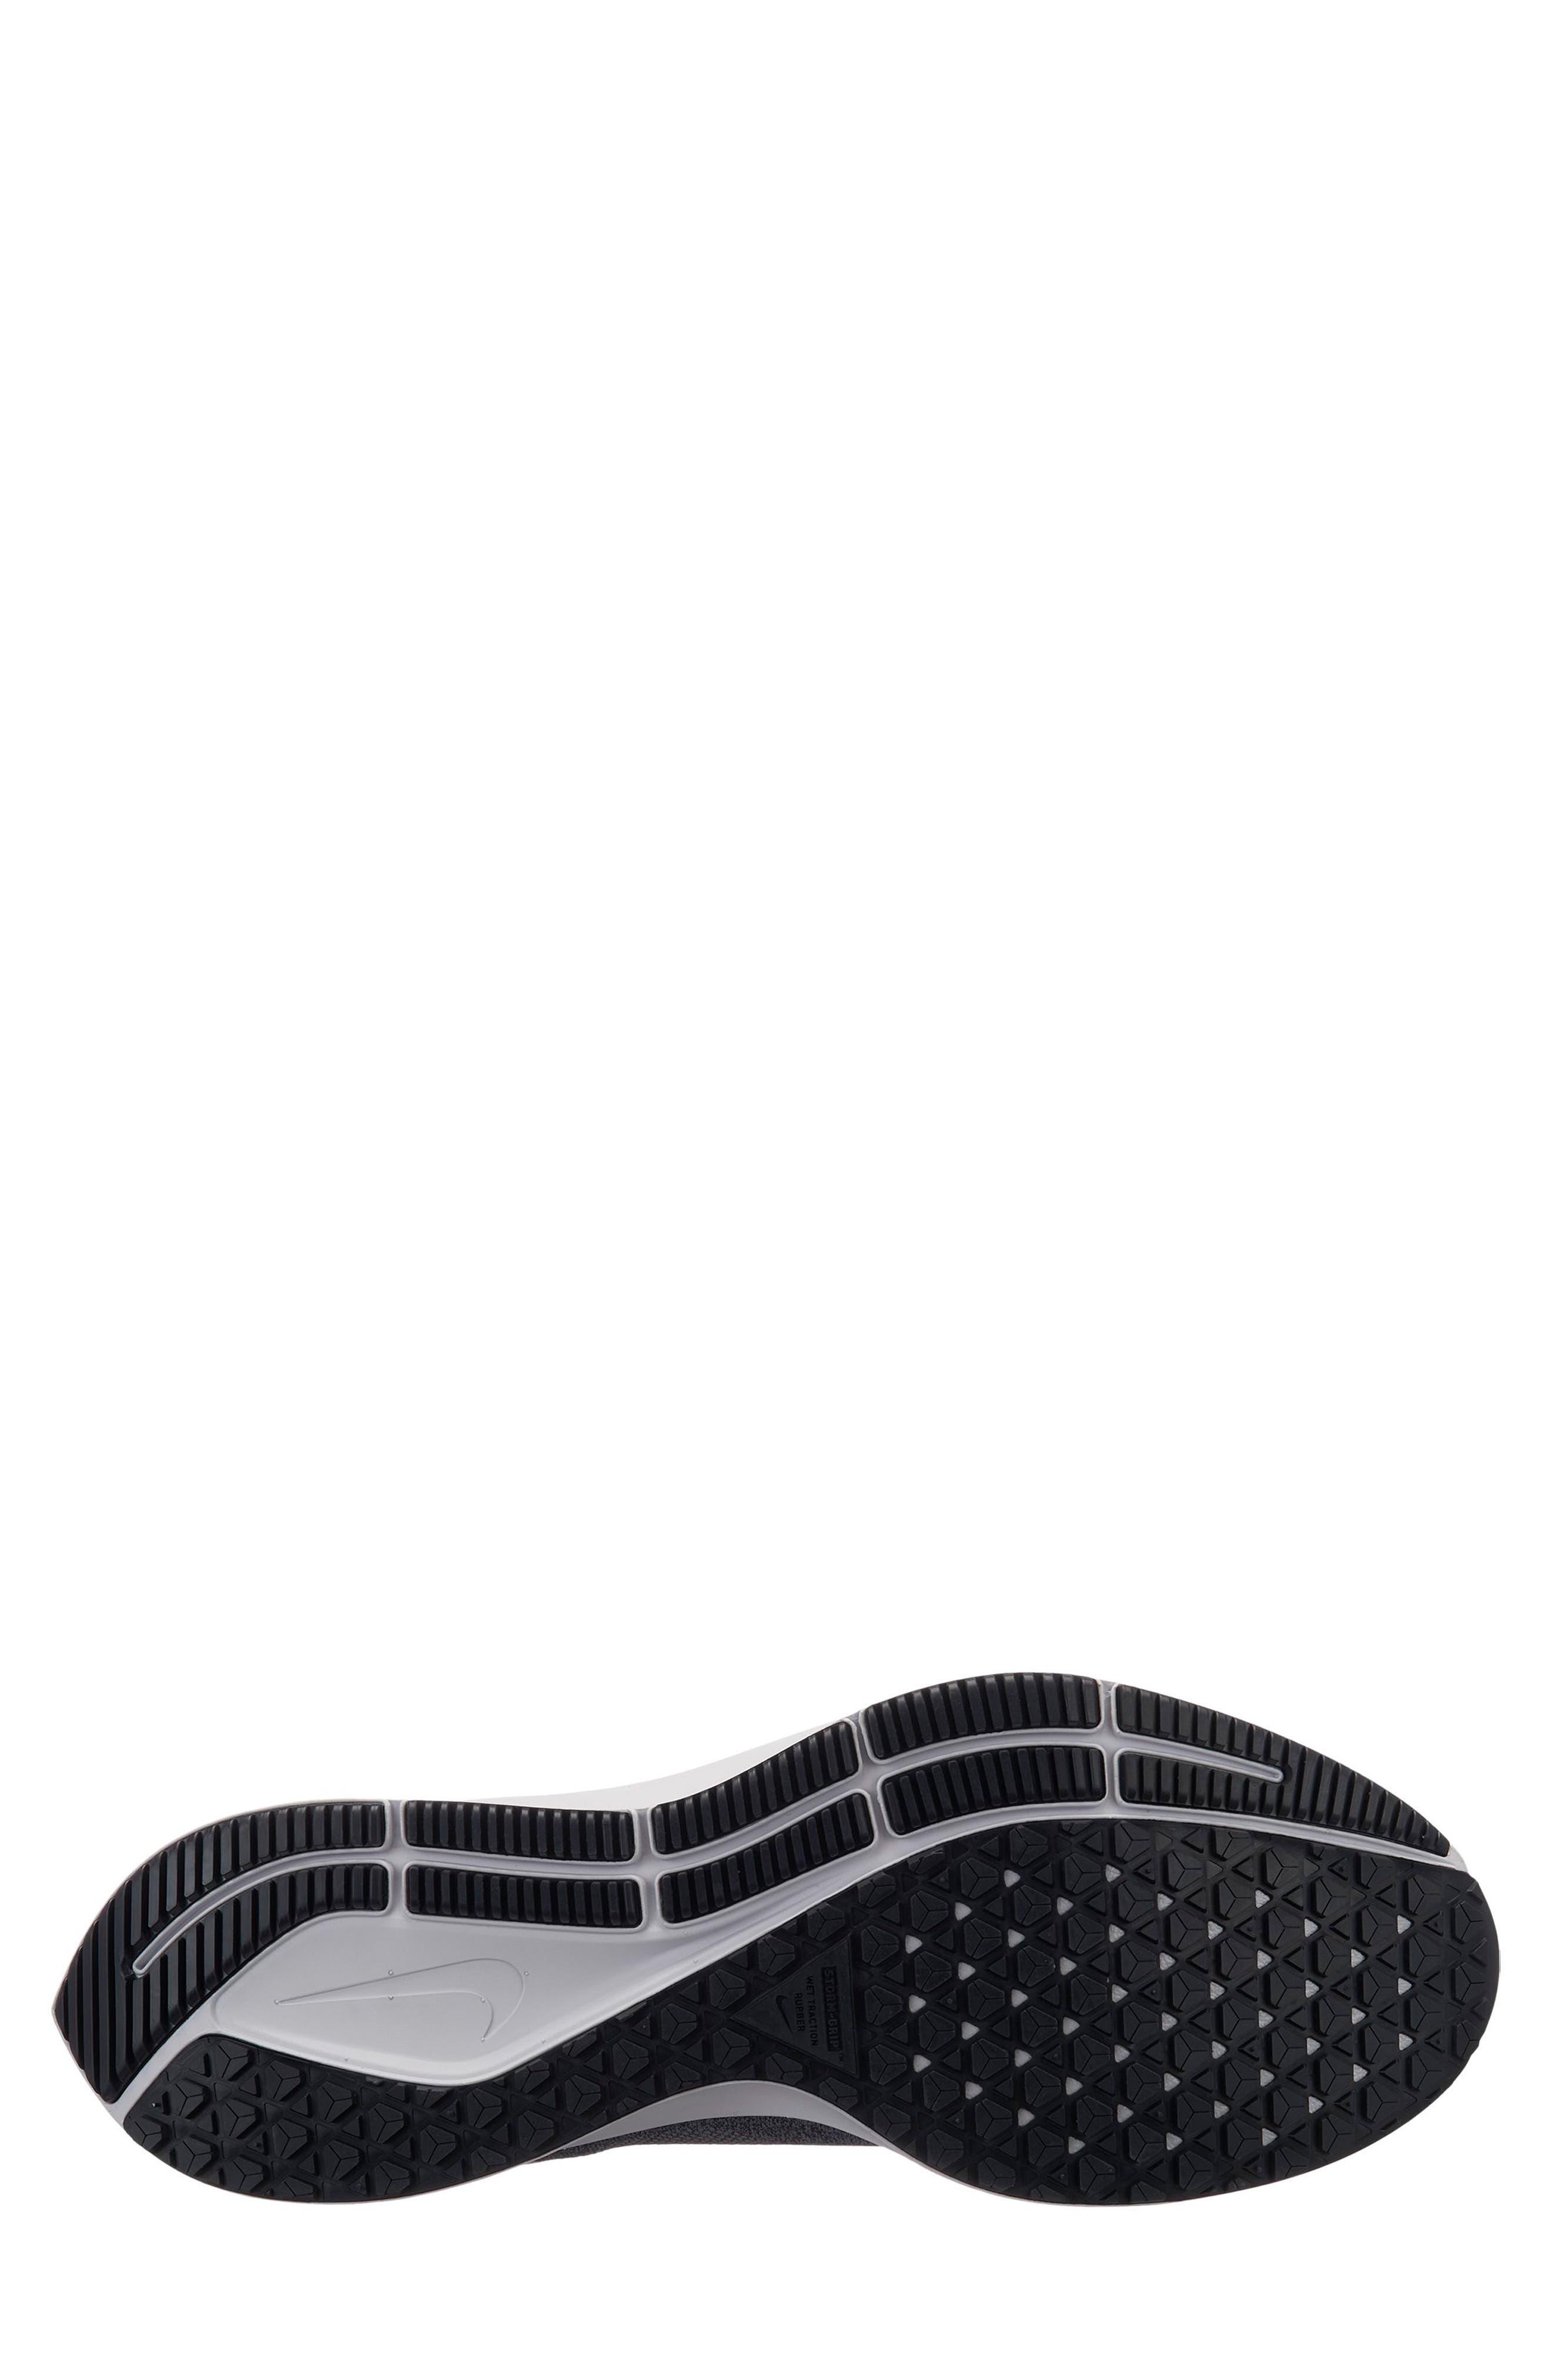 Air Zoom Pegasus 35 Shield Water Repellent Running Shoe,                             Alternate thumbnail 4, color,                             BLACK/ WHITE/ COOL GREY